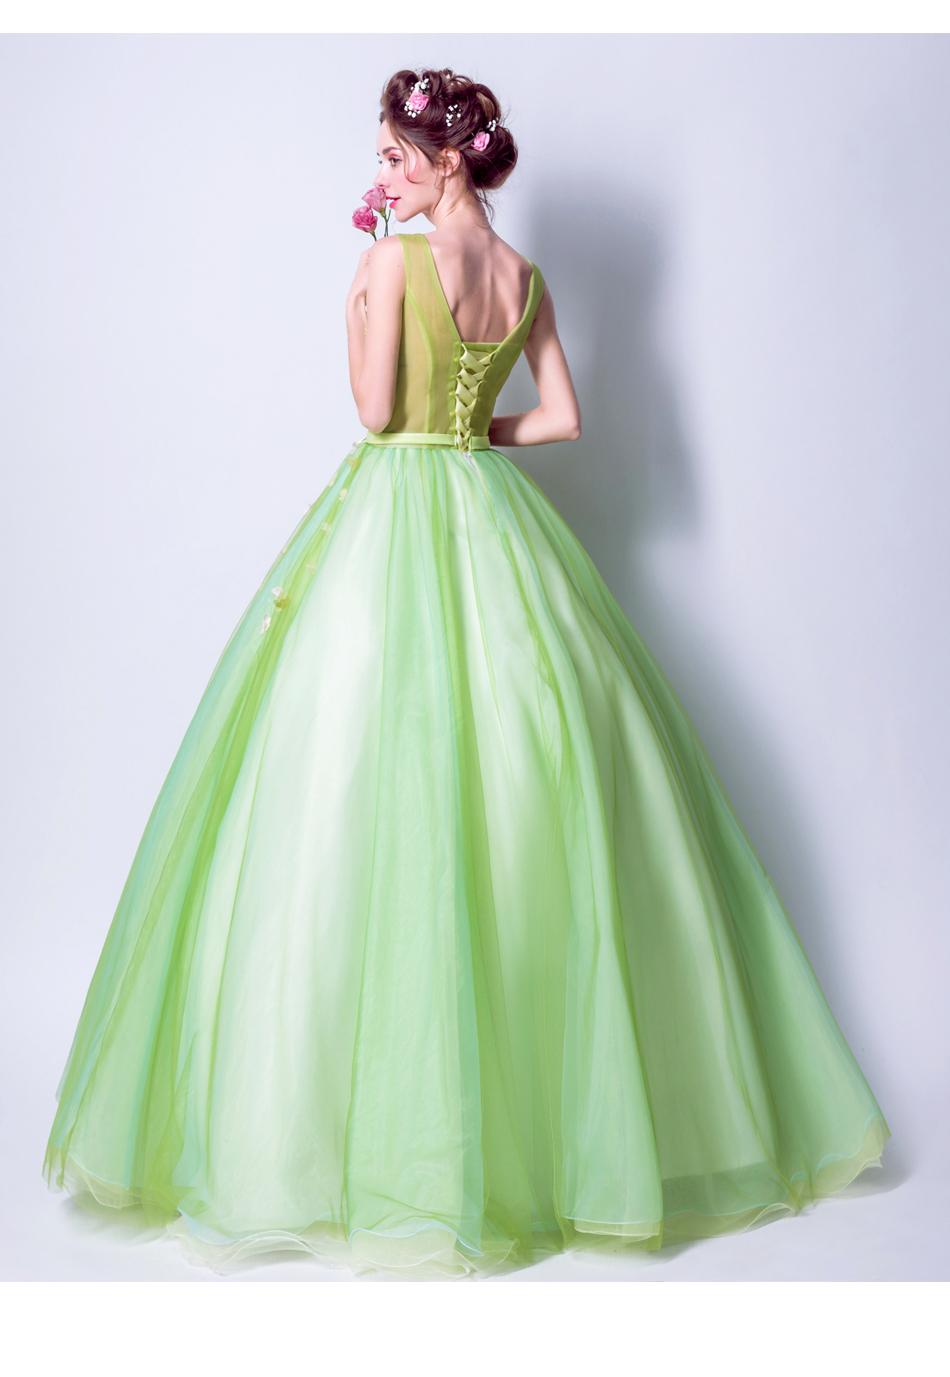 Angel Wedding Dress Marriage Bride Bridal Gown Vestido De Noiva 2017Soft powder, Qingjian Lvxian beauty, petals, green 9718 20